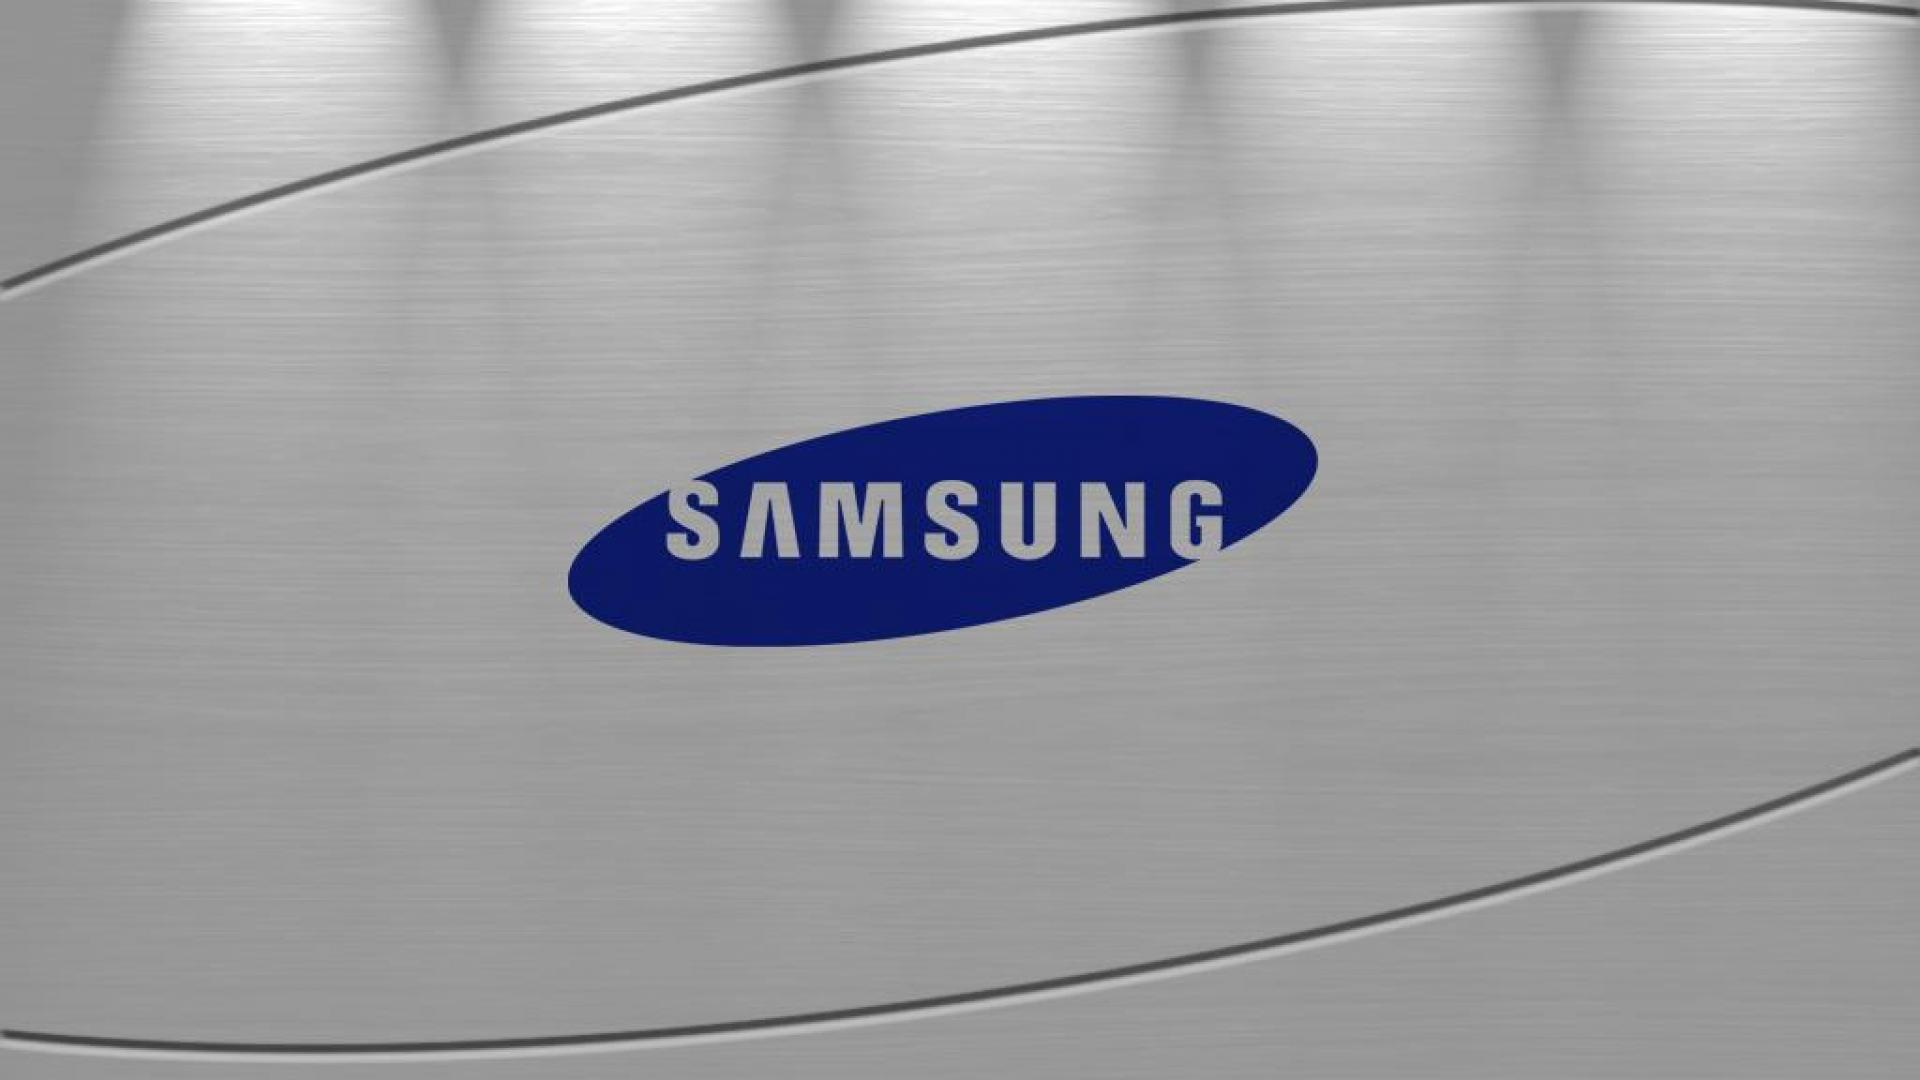 Samsung Logo on Brushed Metal   1920x1080   Full HD 169 1920x1080